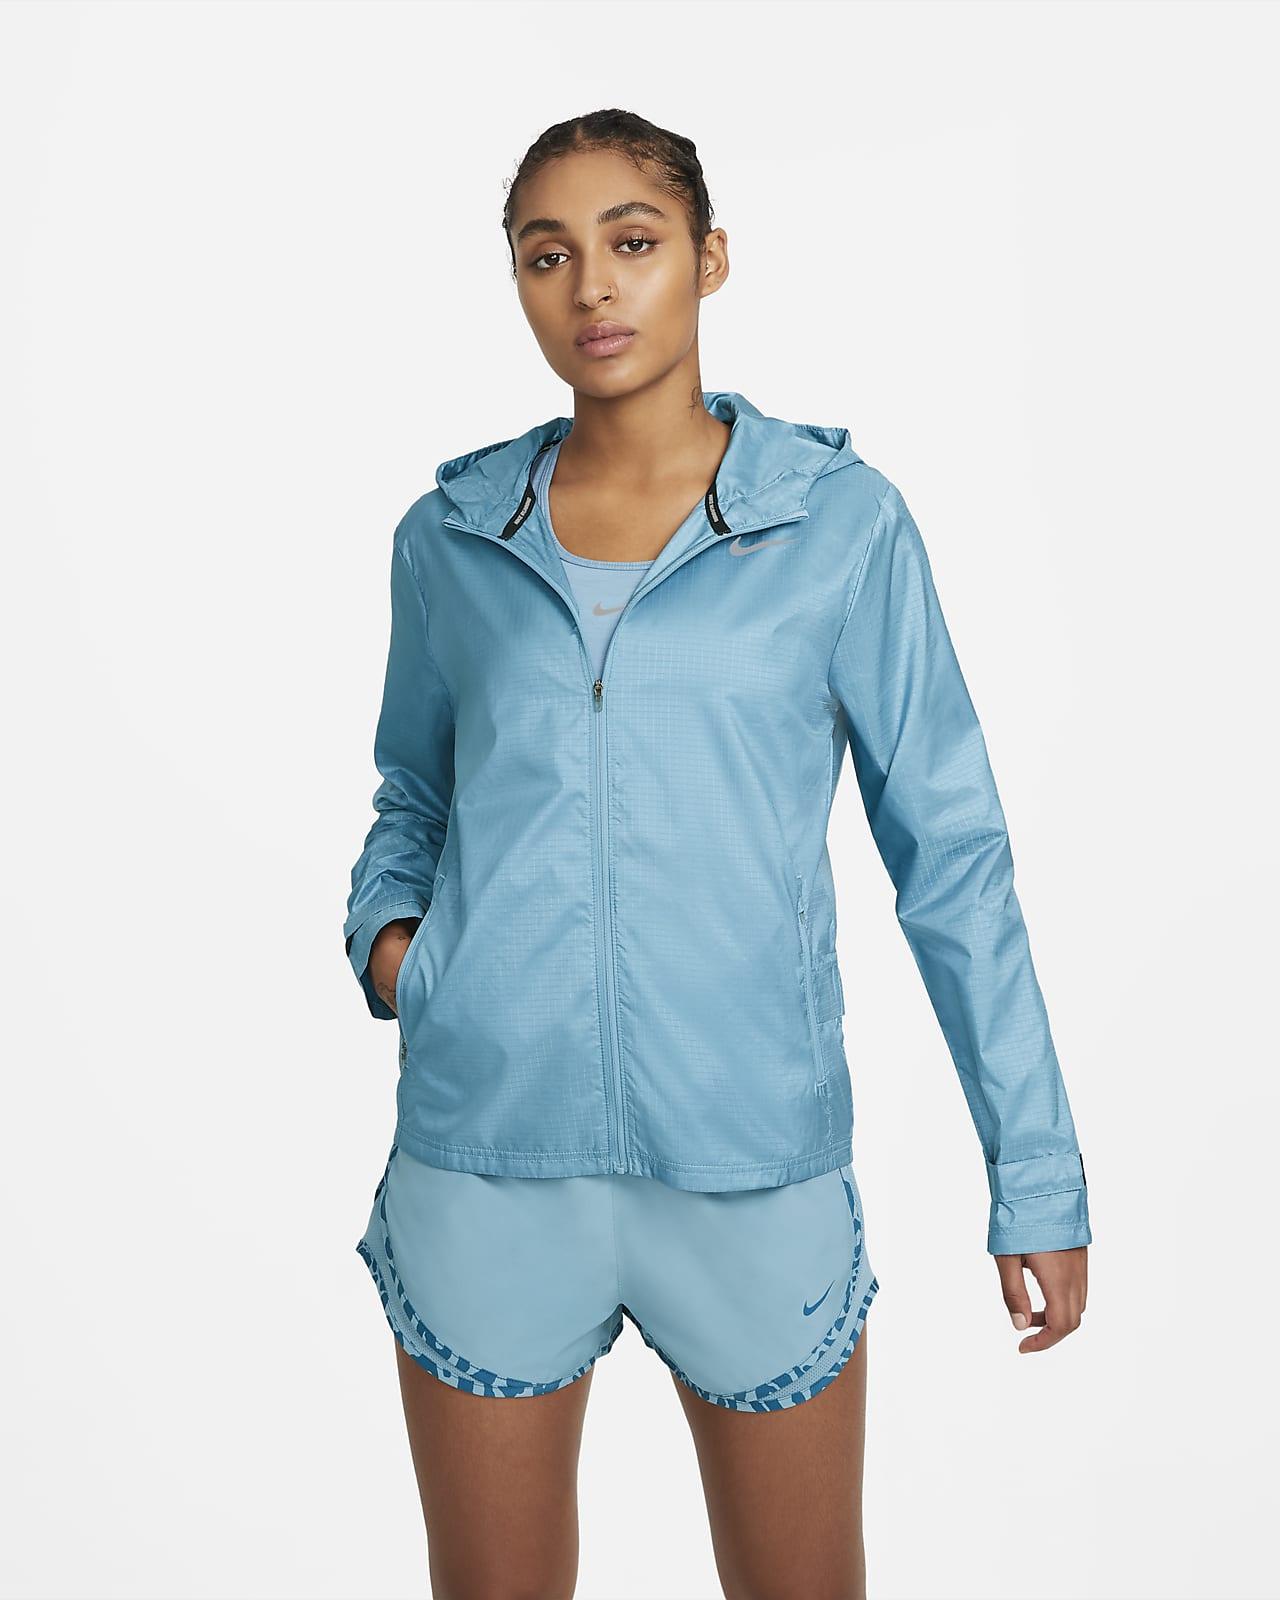 Chamarra de running para mujer Nike Essential